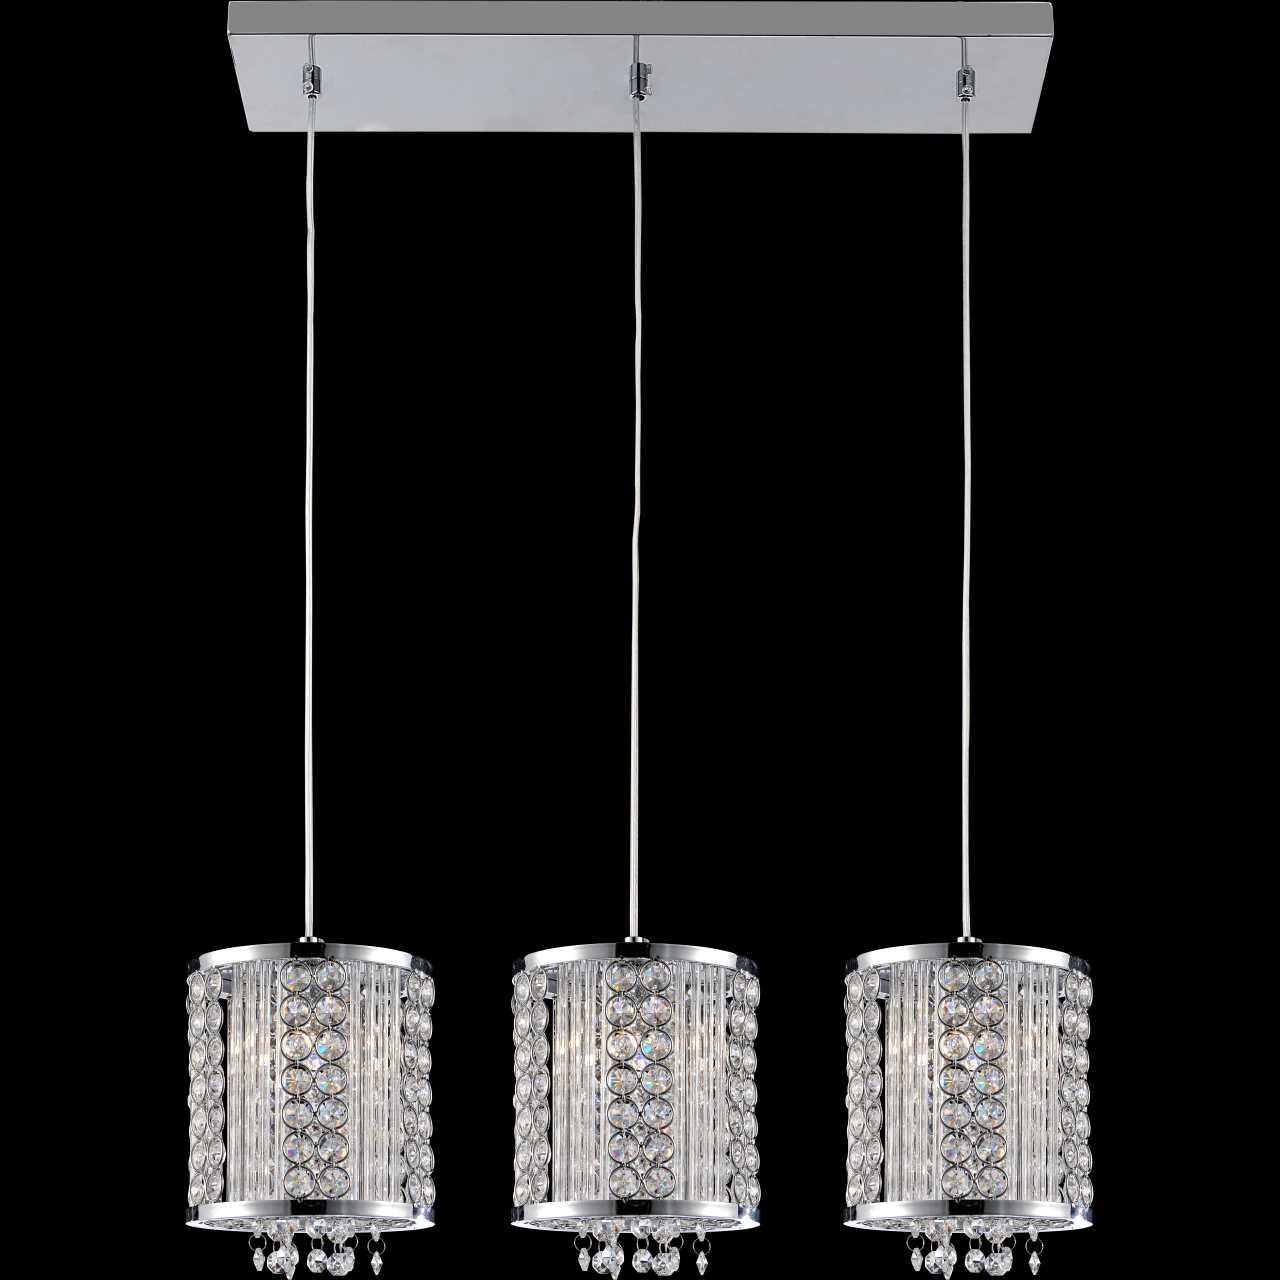 Brizzo lighting stores 28 cristallo modern crystal linear mini picture of 28 cristallo modern crystal linear mini pendants on rectangular platform polished chrome aloadofball Gallery